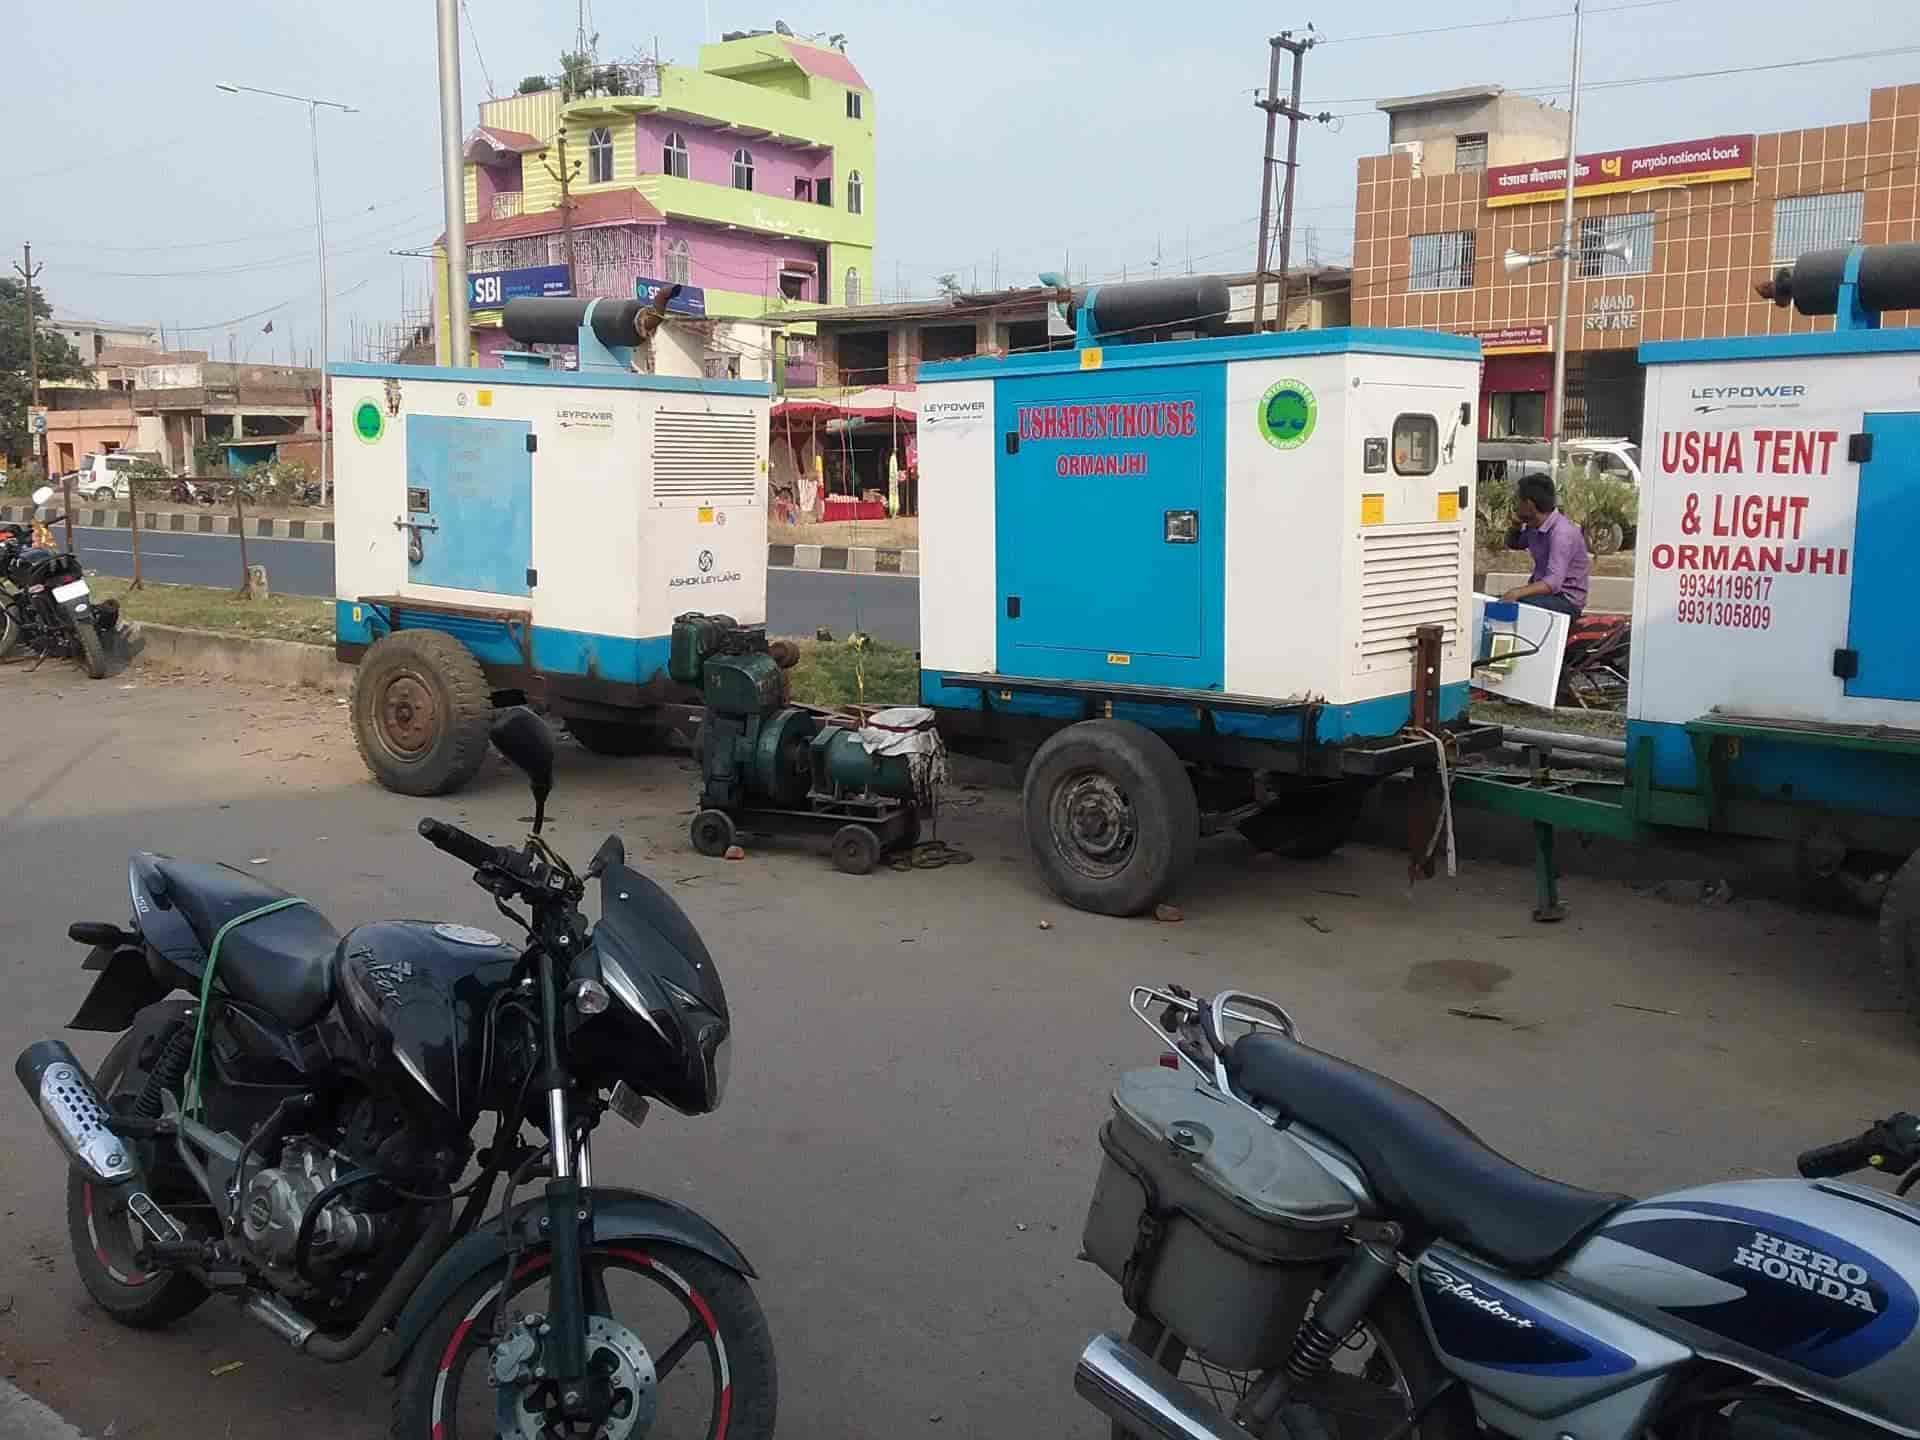 Usha Tent House And Light, Ormanjhi - Generators On Hire in Ranchi